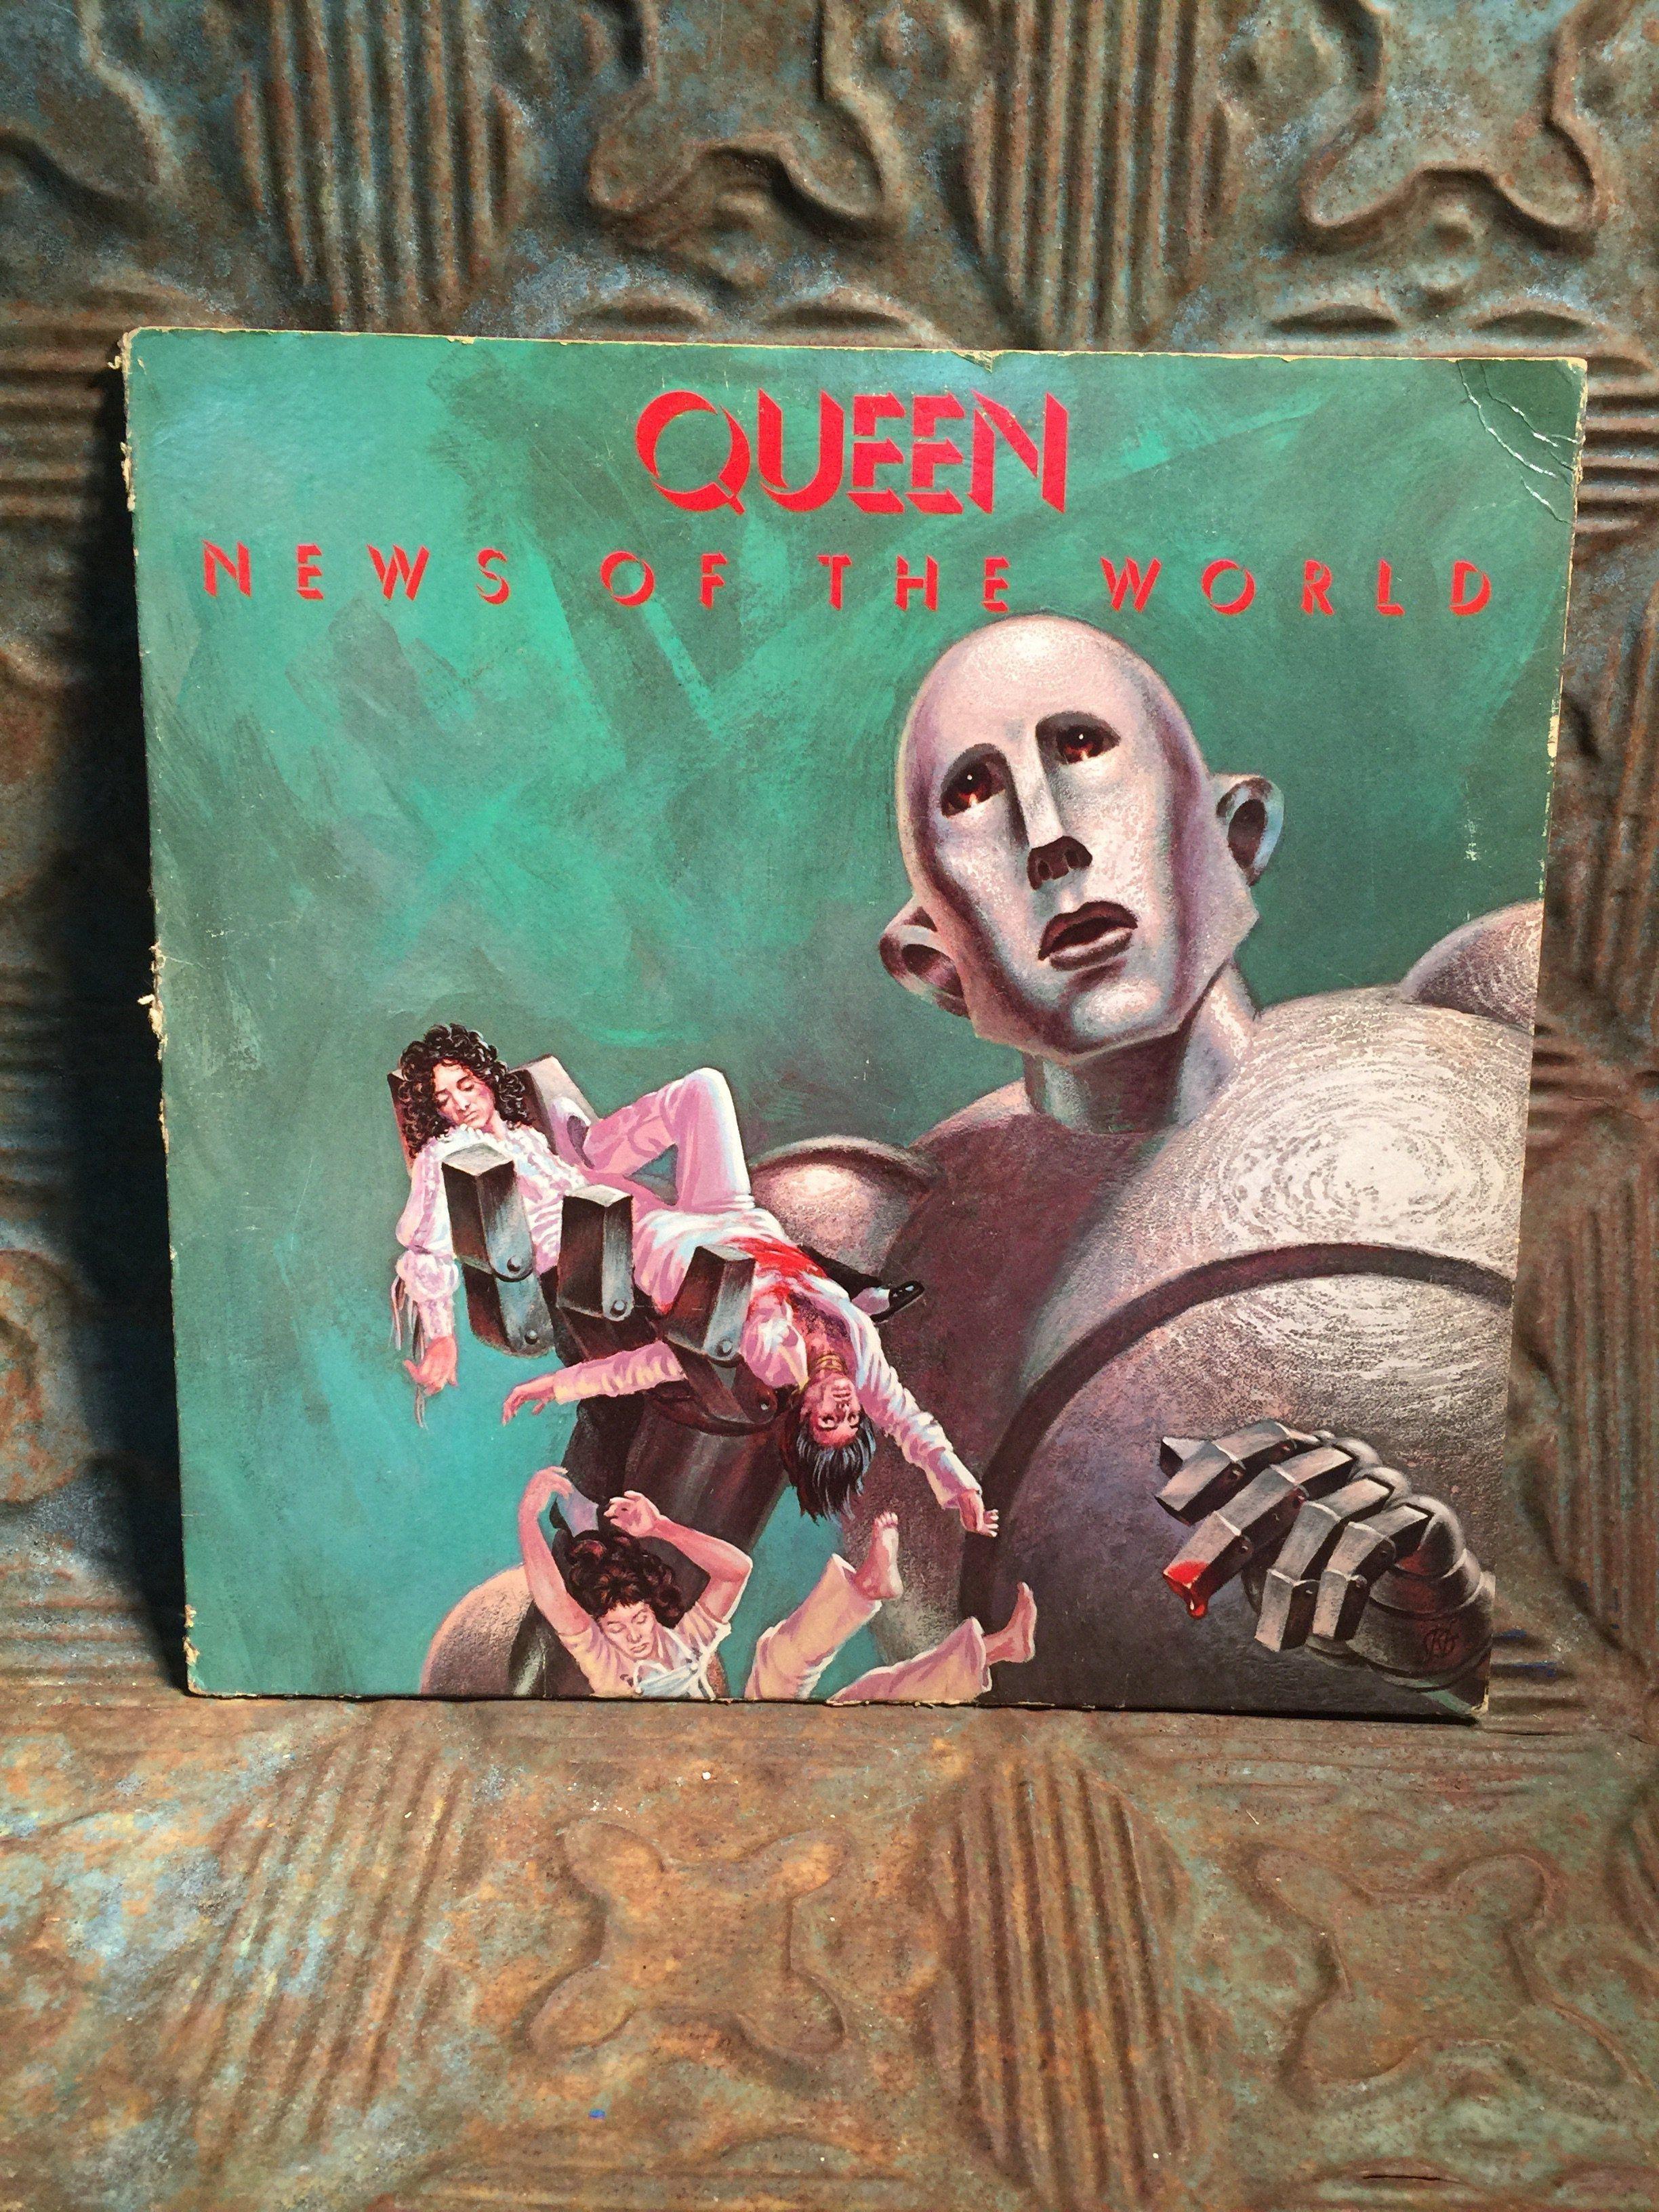 Queen 1977 News Of The World Vinyl Lp Record Album Vinyl Records